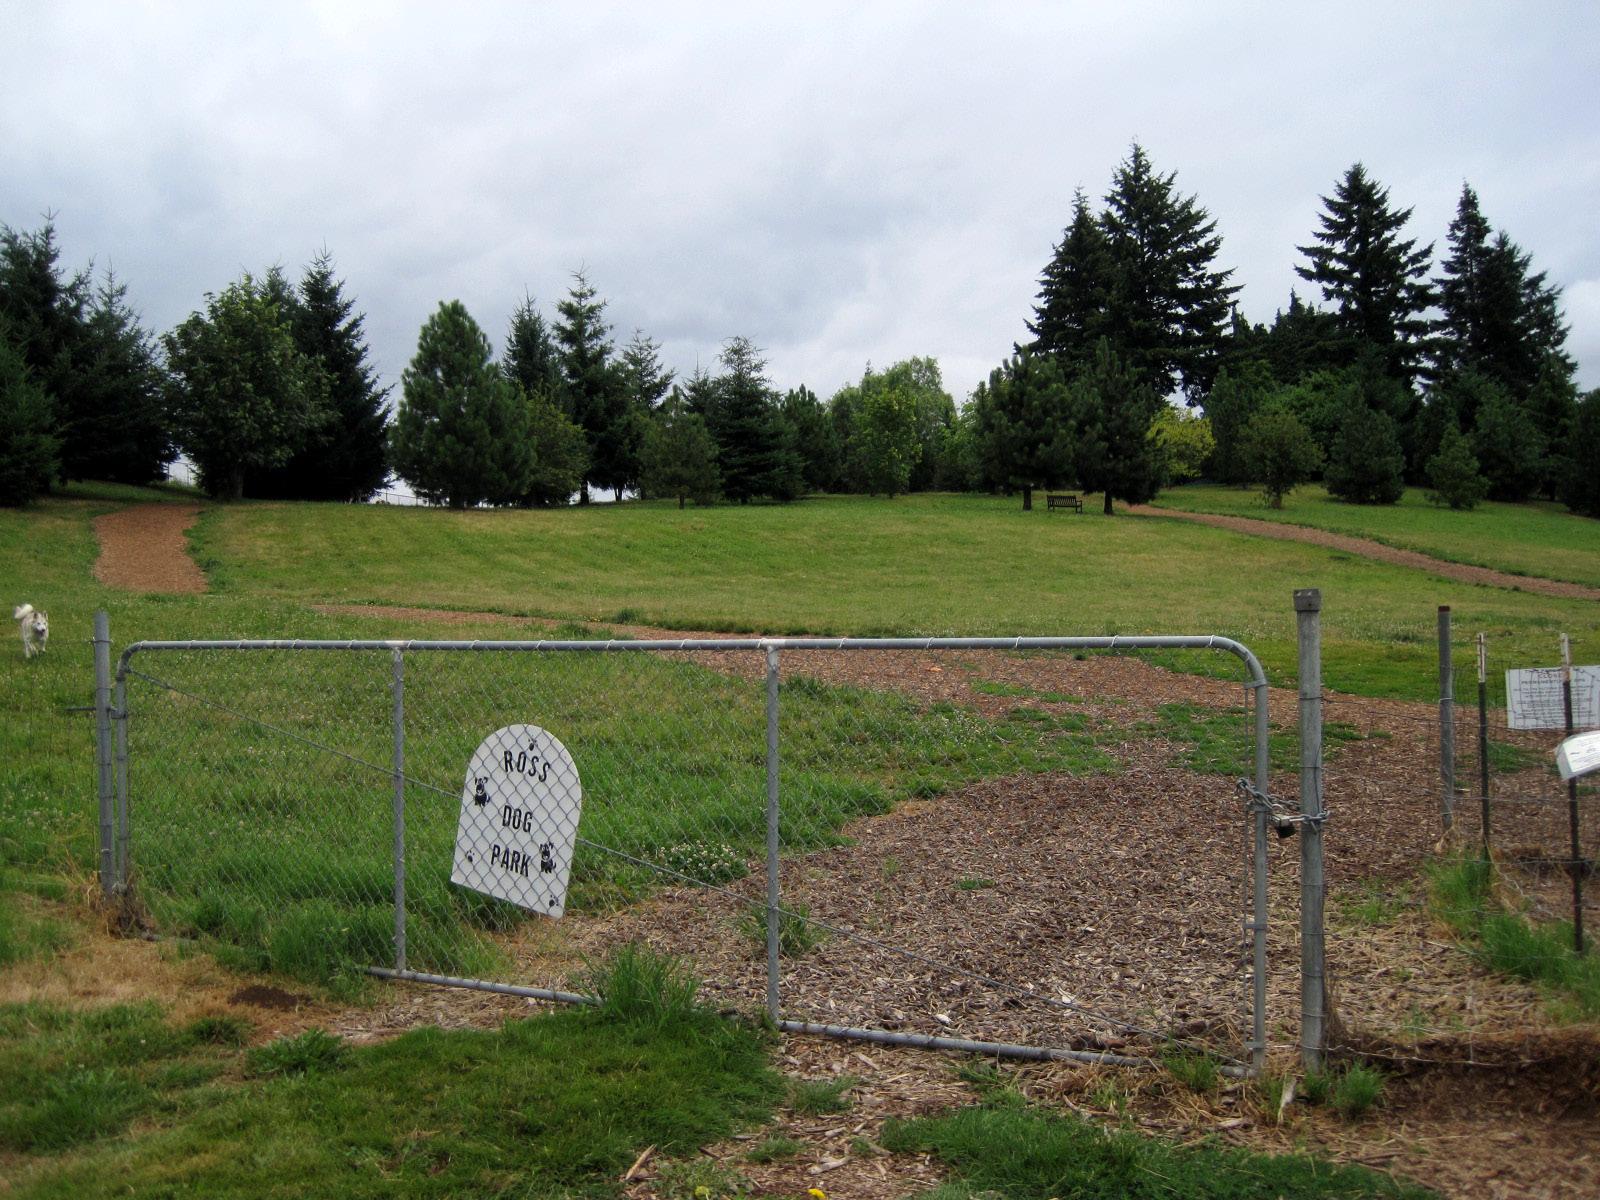 Ross Dog Park Vancouver Wa